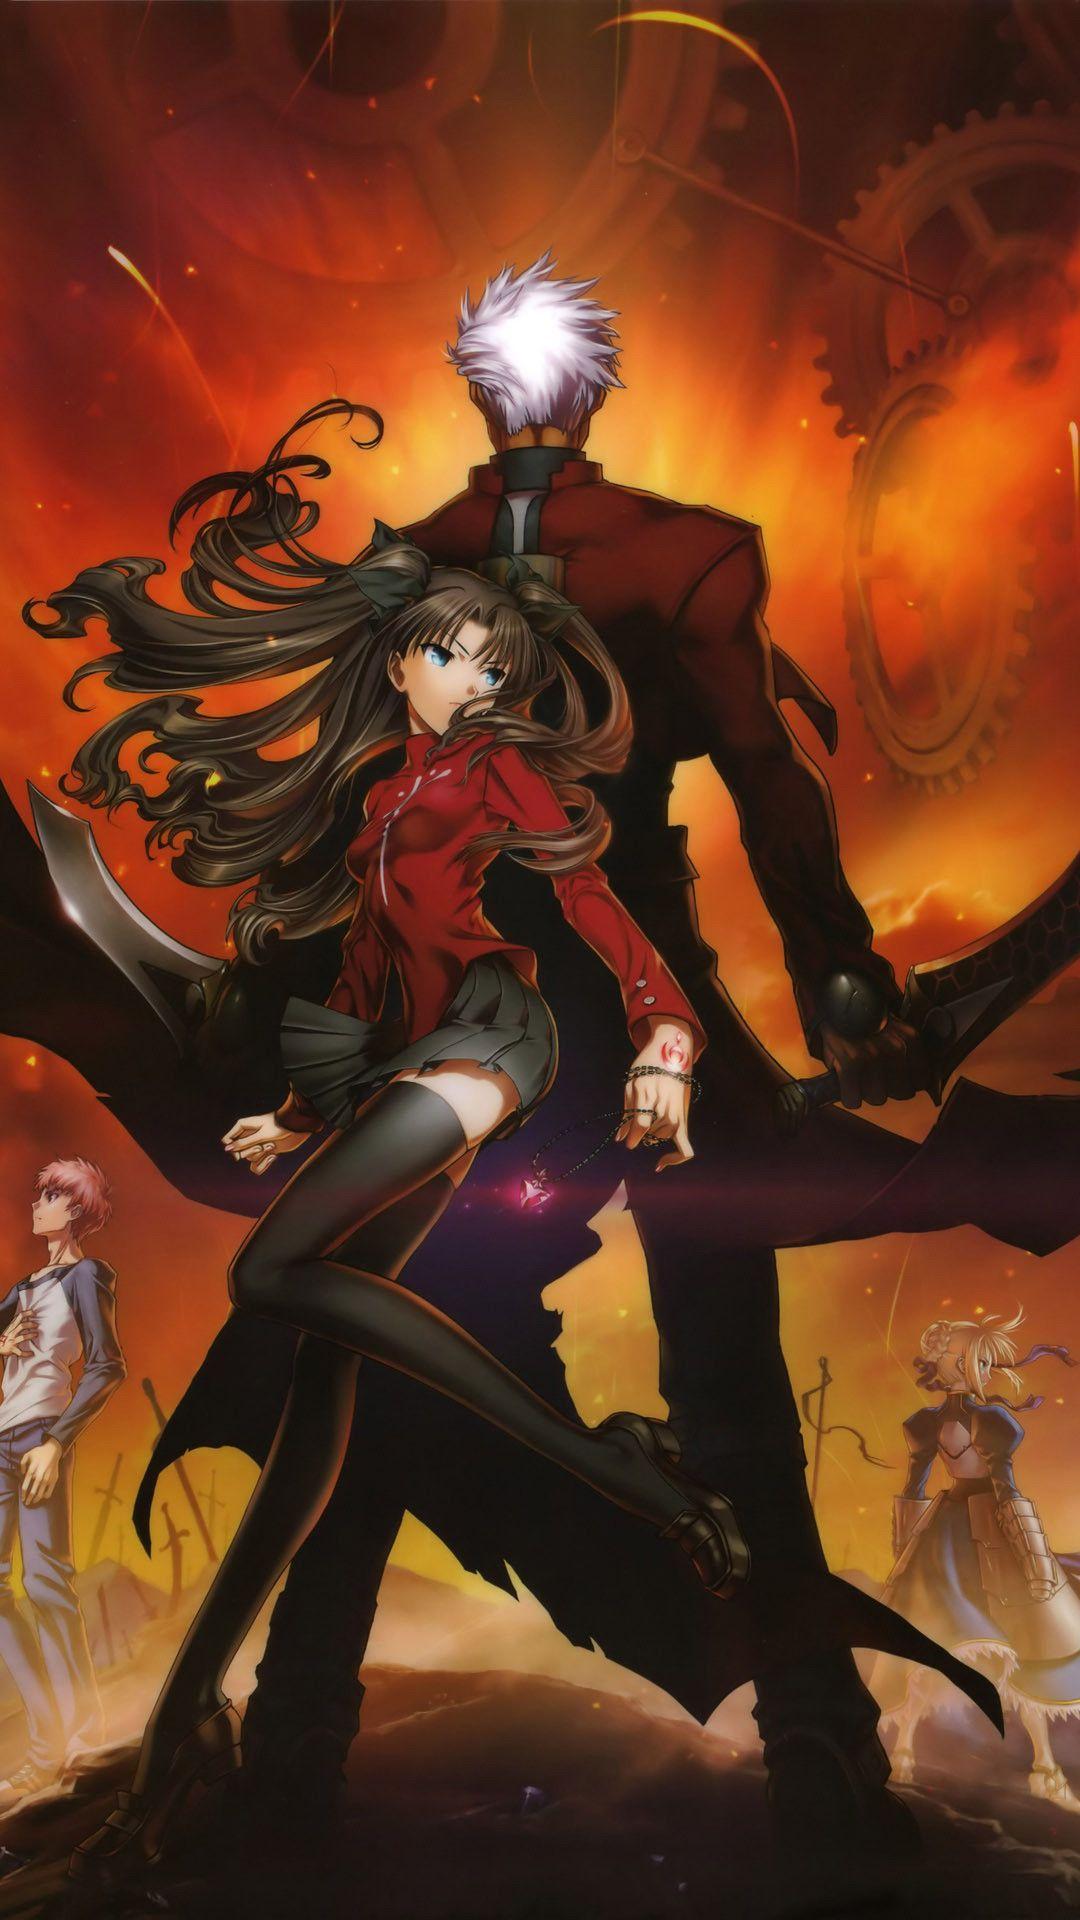 Fate Zero Iphone Wallpapers Top Free Fate Zero Iphone